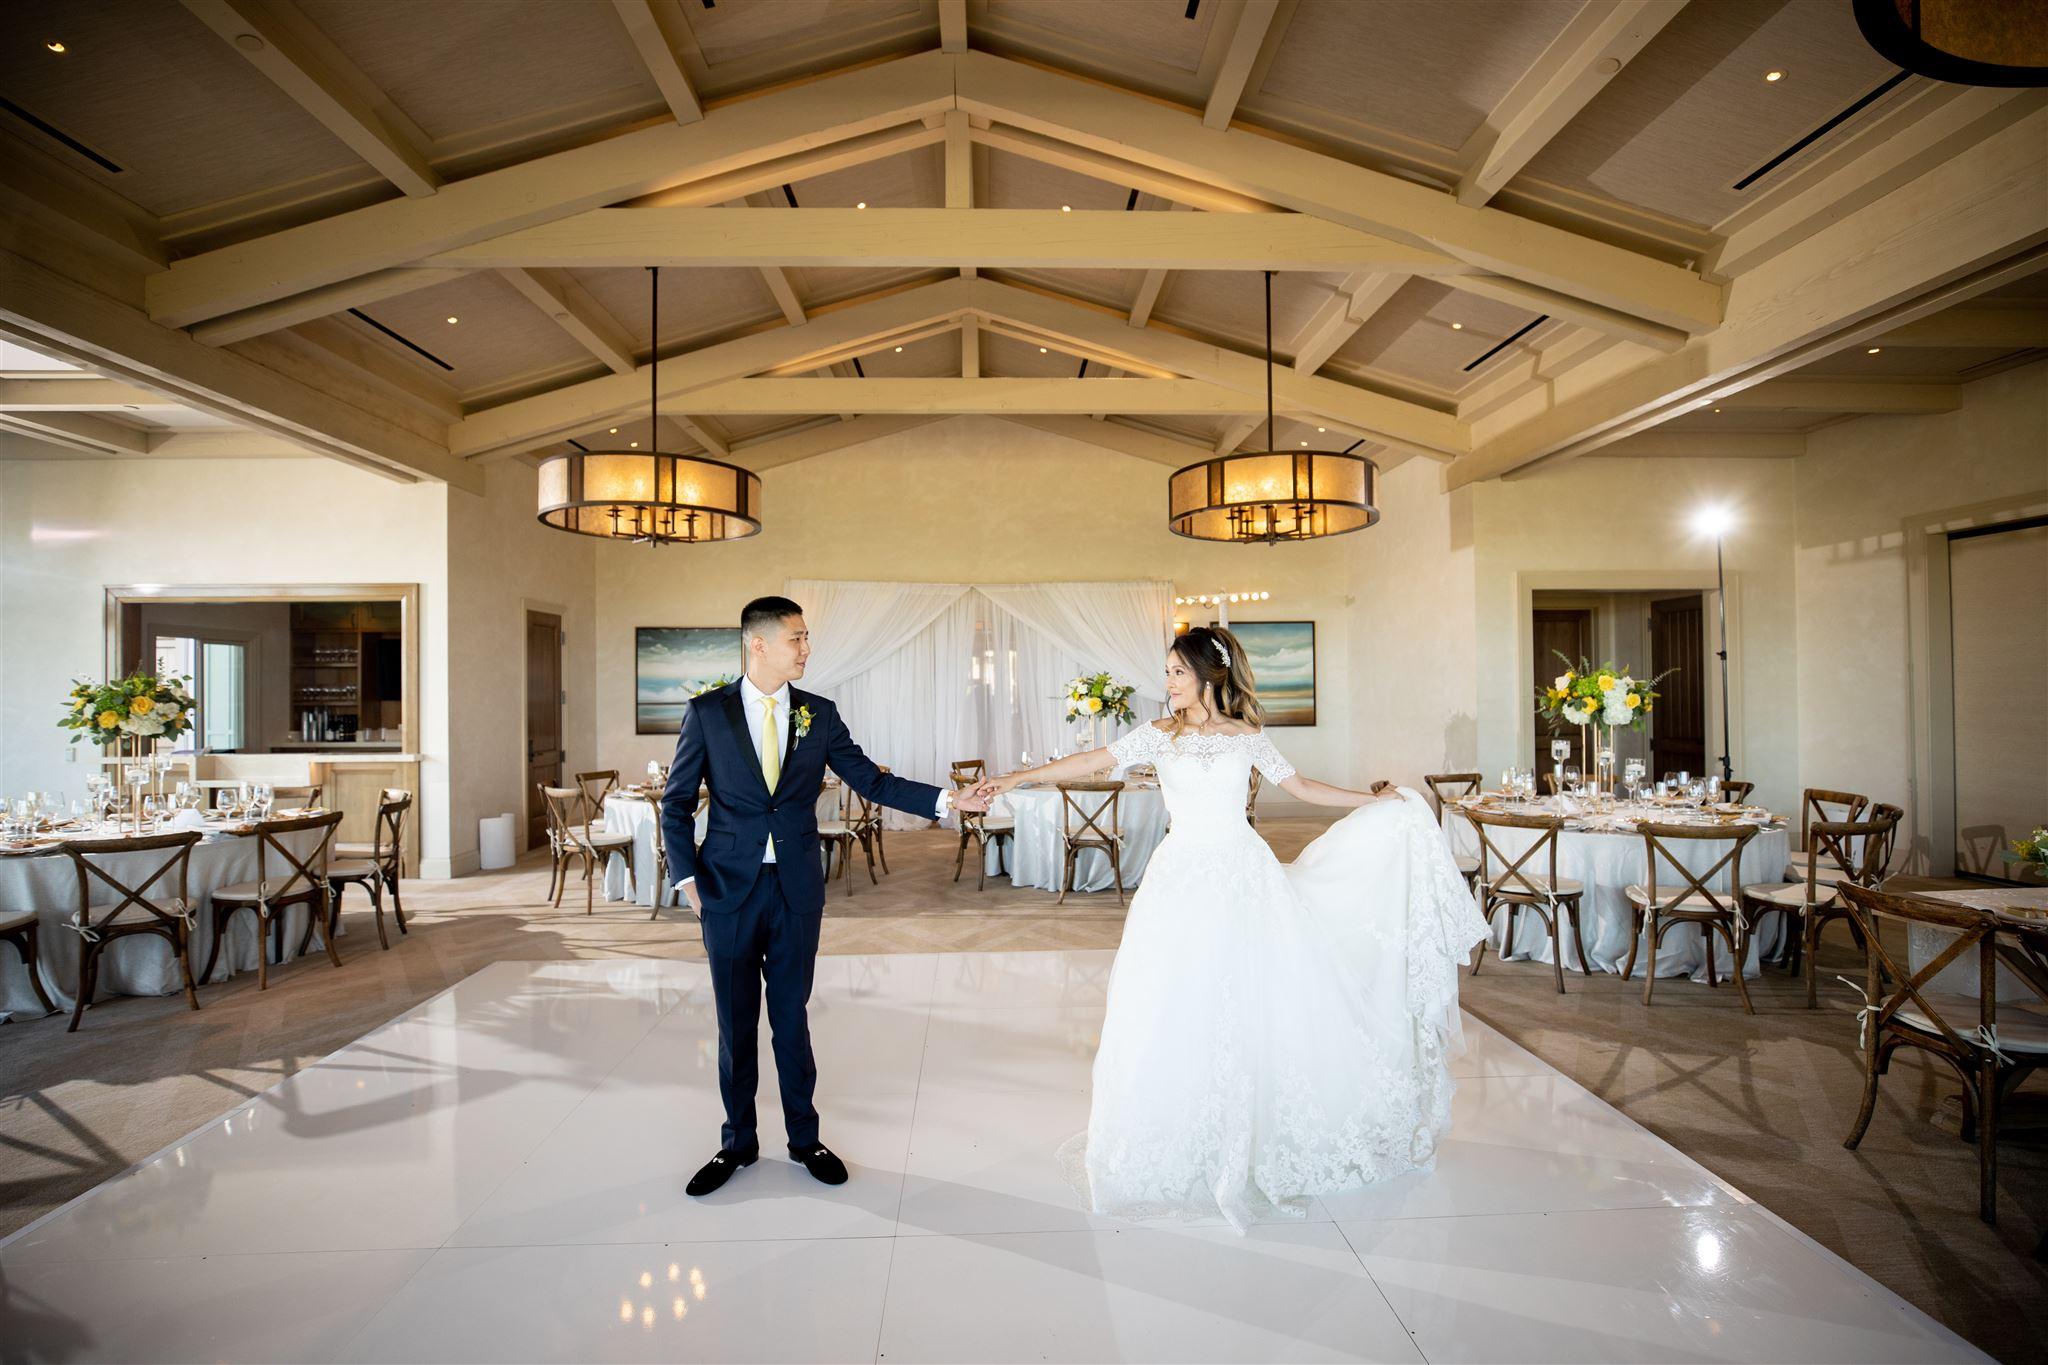 ROLLING HILLS COUNTRY CLUB WEDDING | ANGELA & BEN